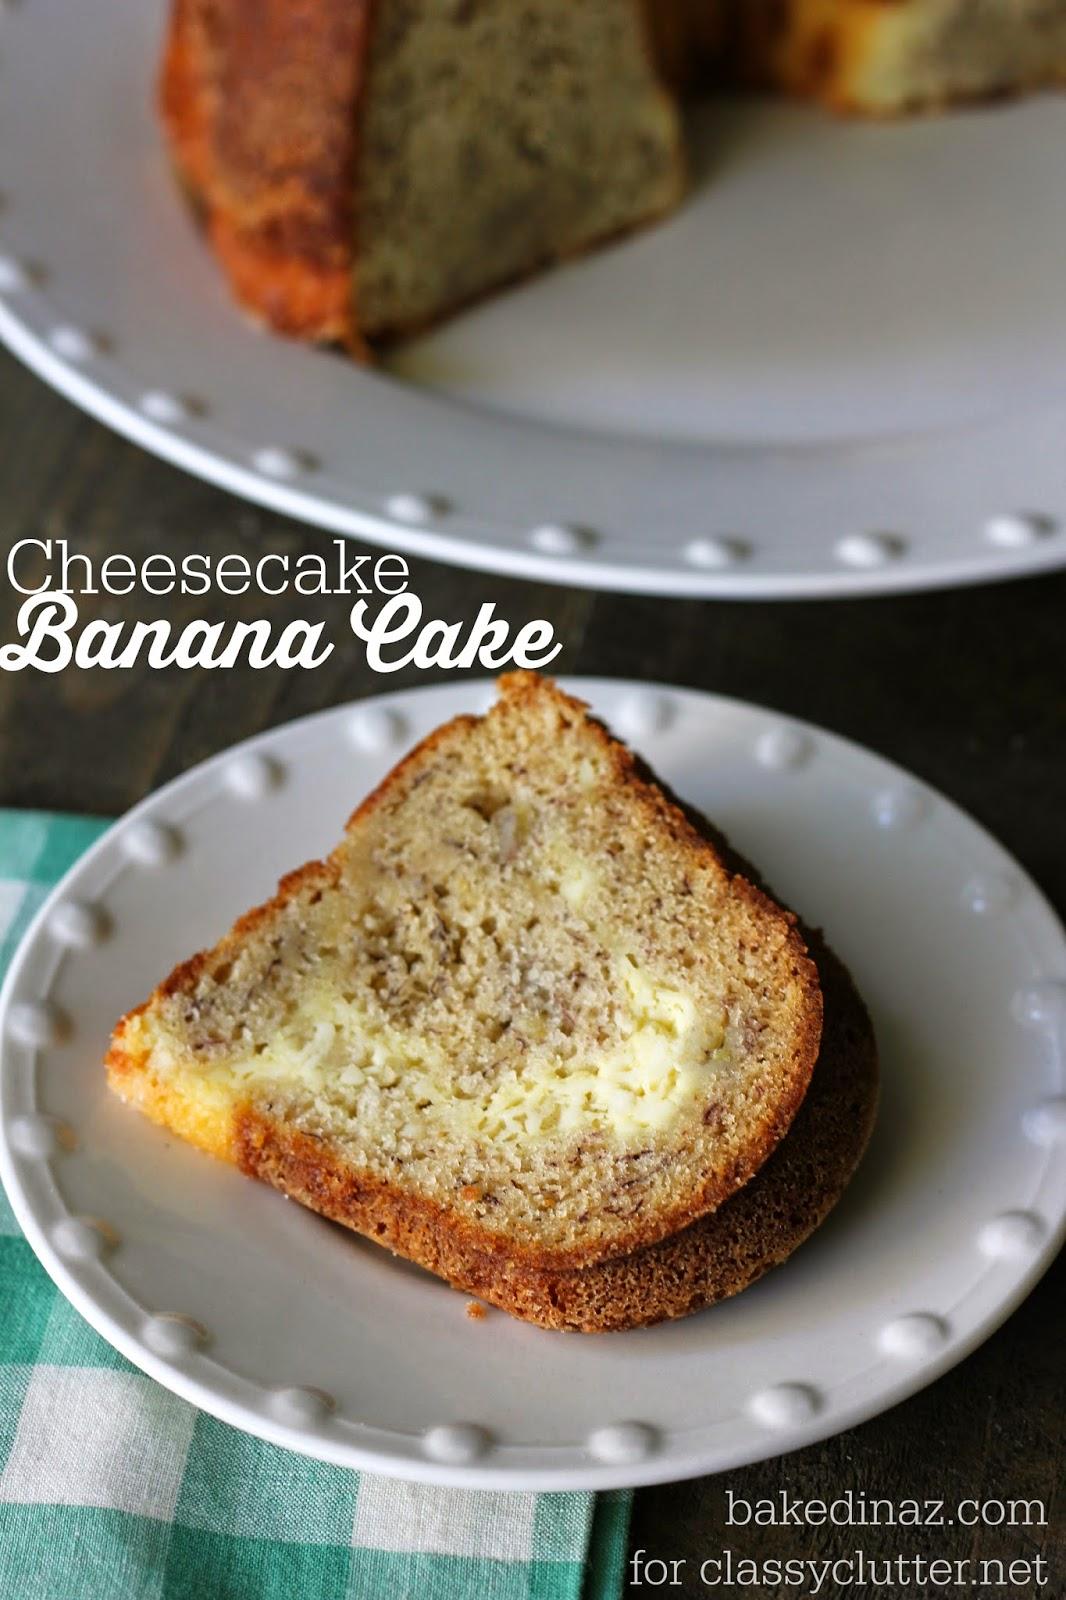 Cheesecake Banana Cake | www.classyclutter.net